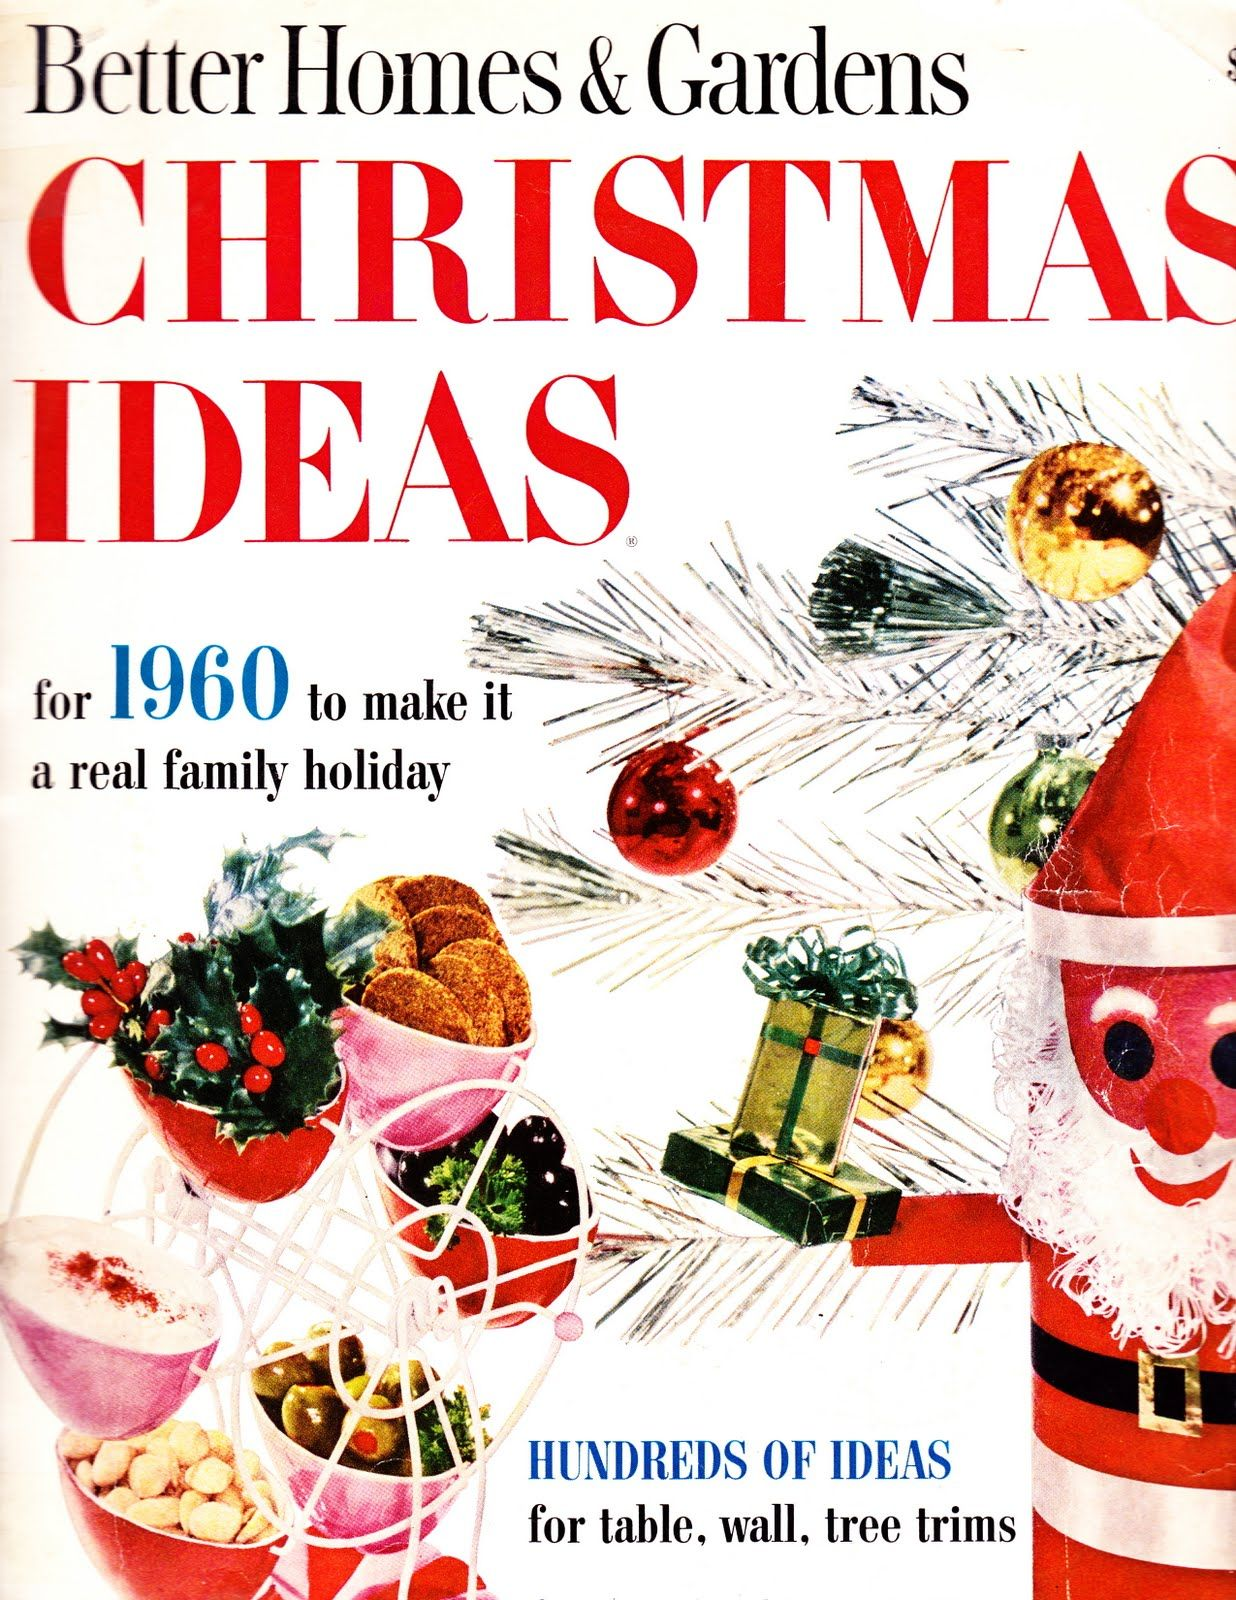 Better Homes & Gardens, 1960 - memories of Mom ~mgh | Christmas ...